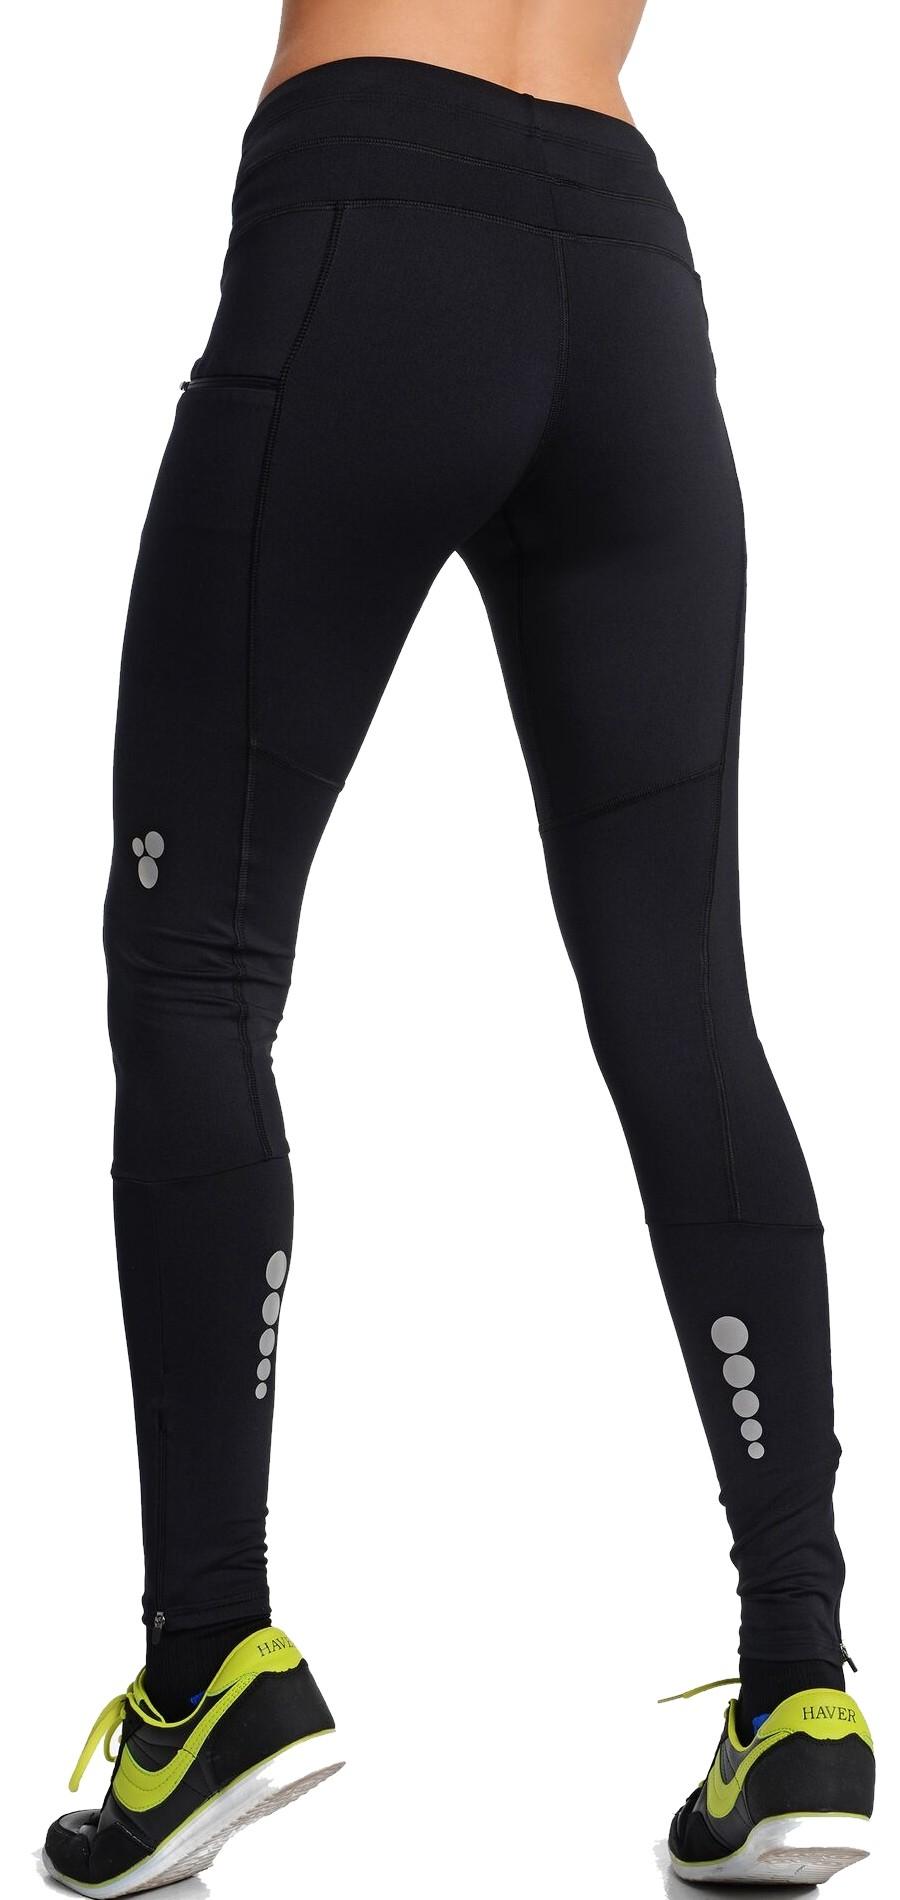 nessi damen sport leggings pro total sdp laufhose fitnesshose mit taschen atmungsaktiv prosske. Black Bedroom Furniture Sets. Home Design Ideas